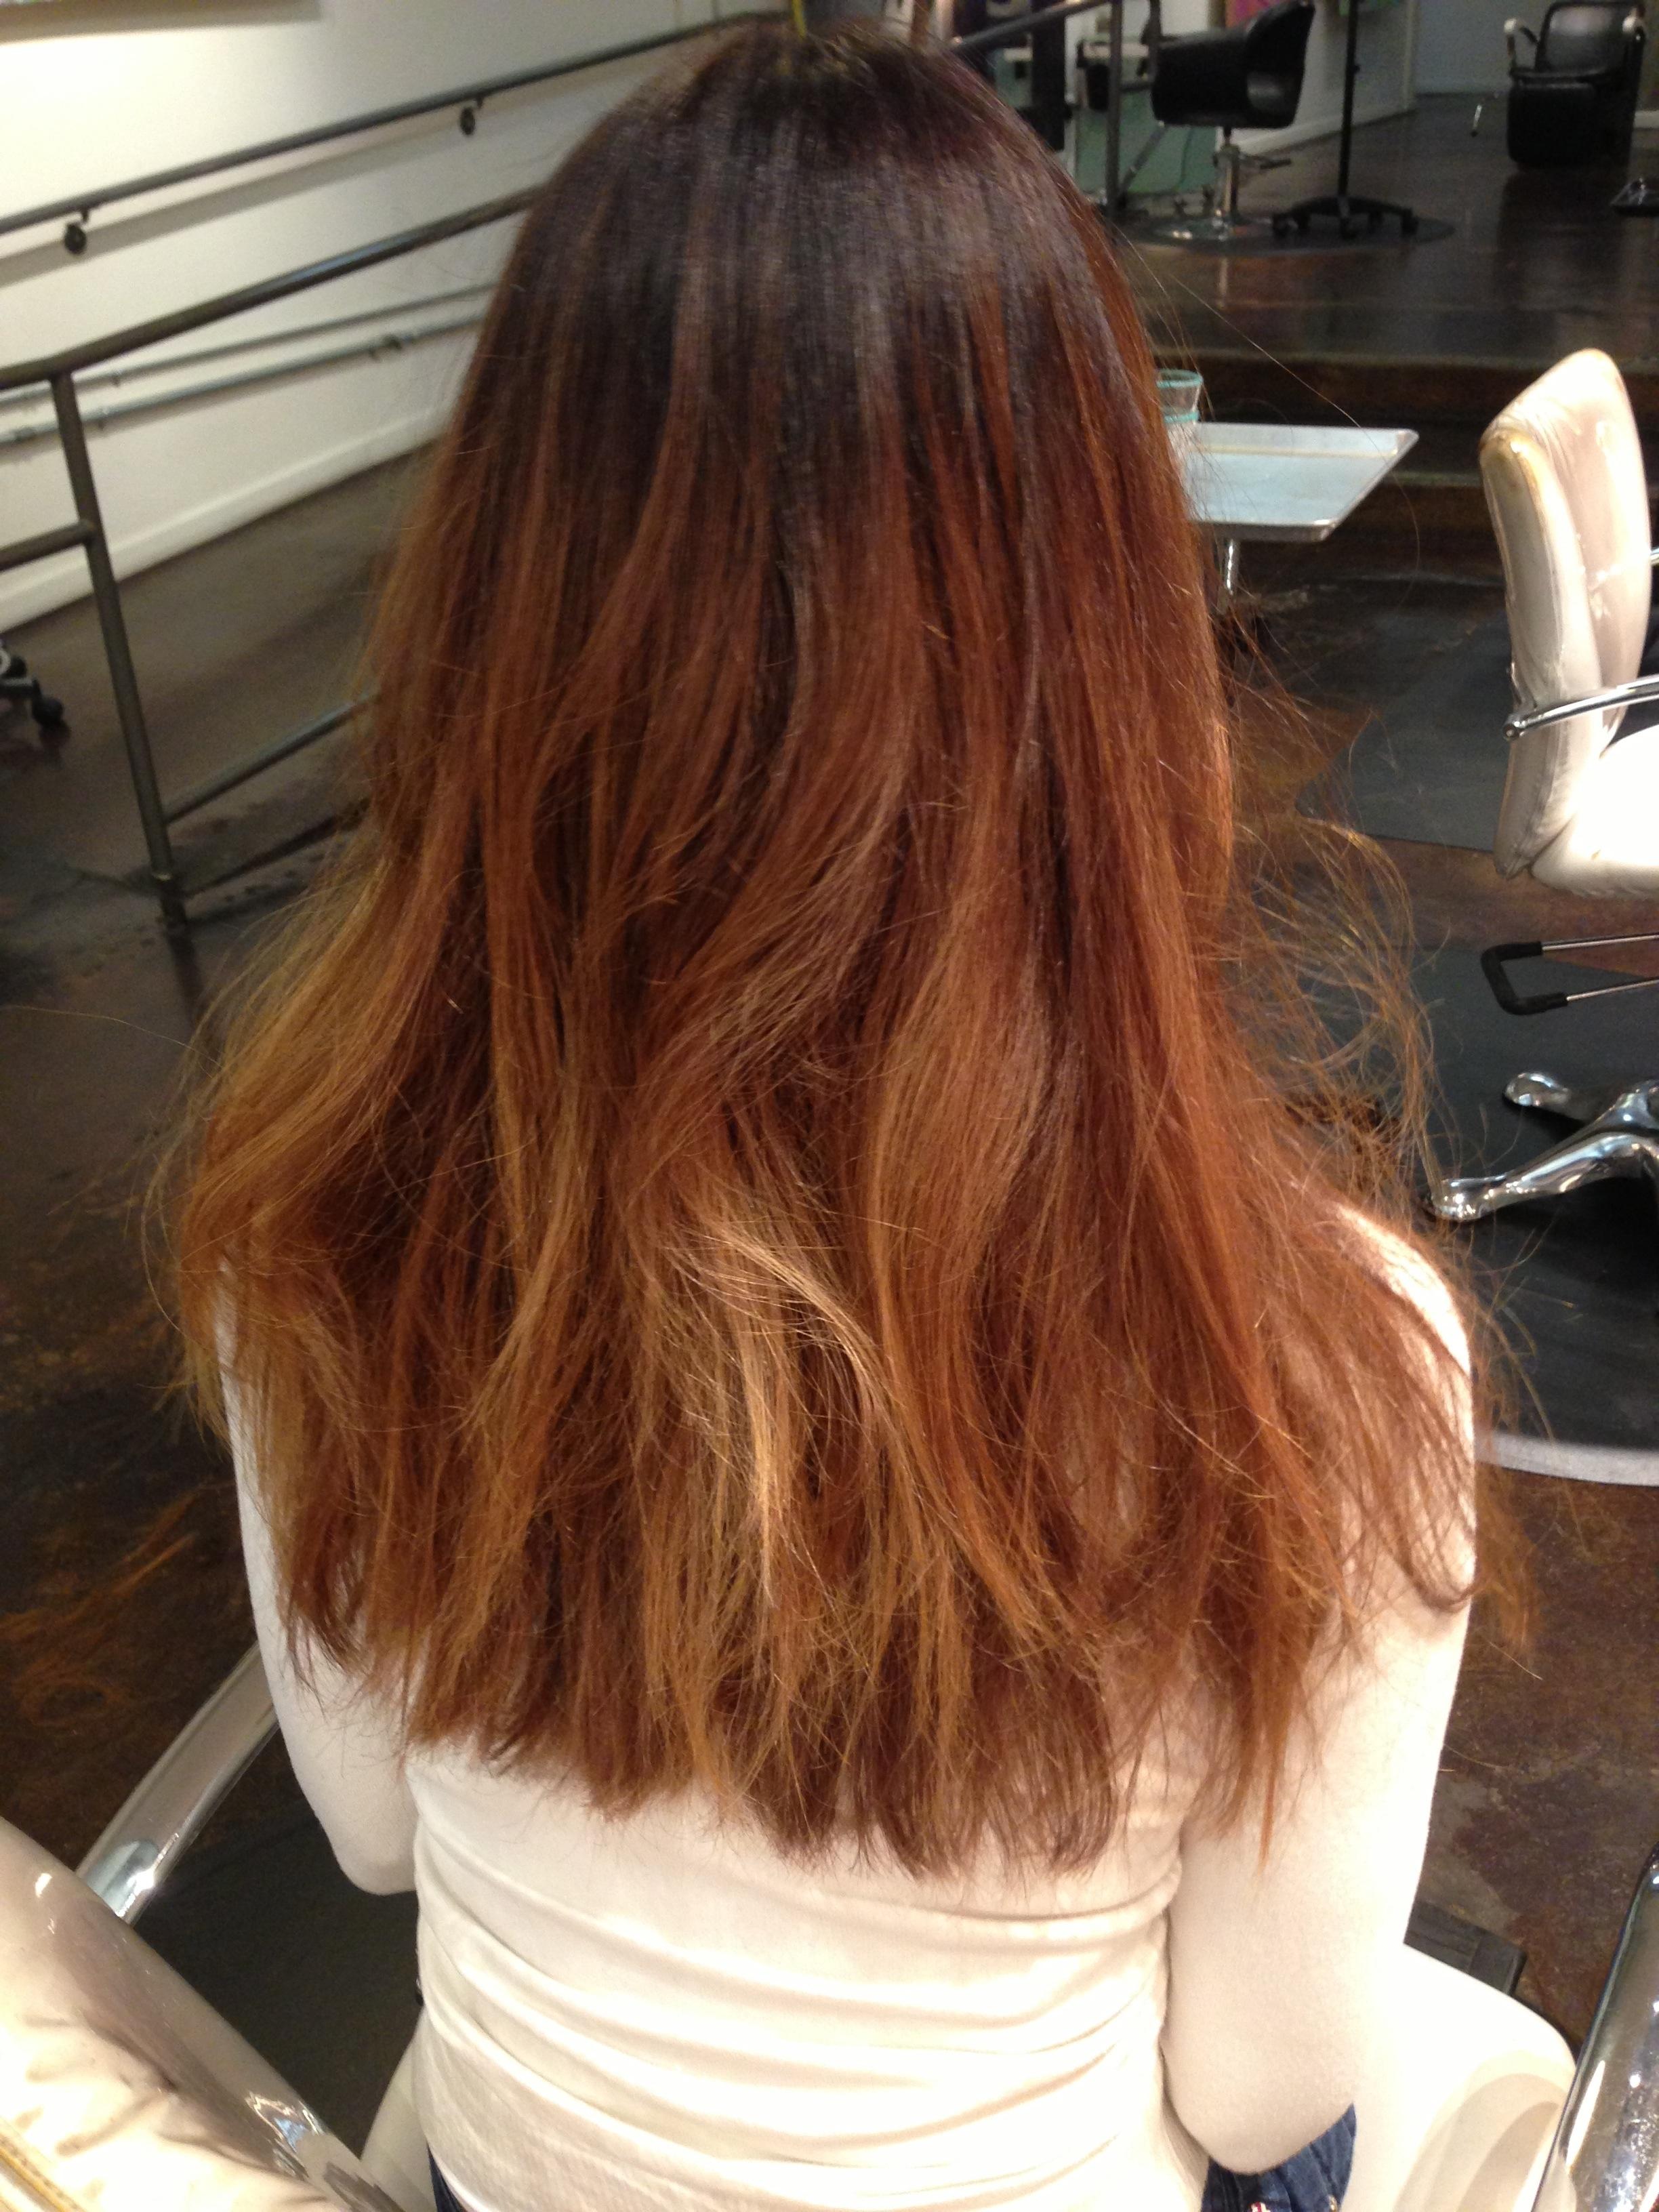 Caramel Highlights On Indian Hair - WeSharePics